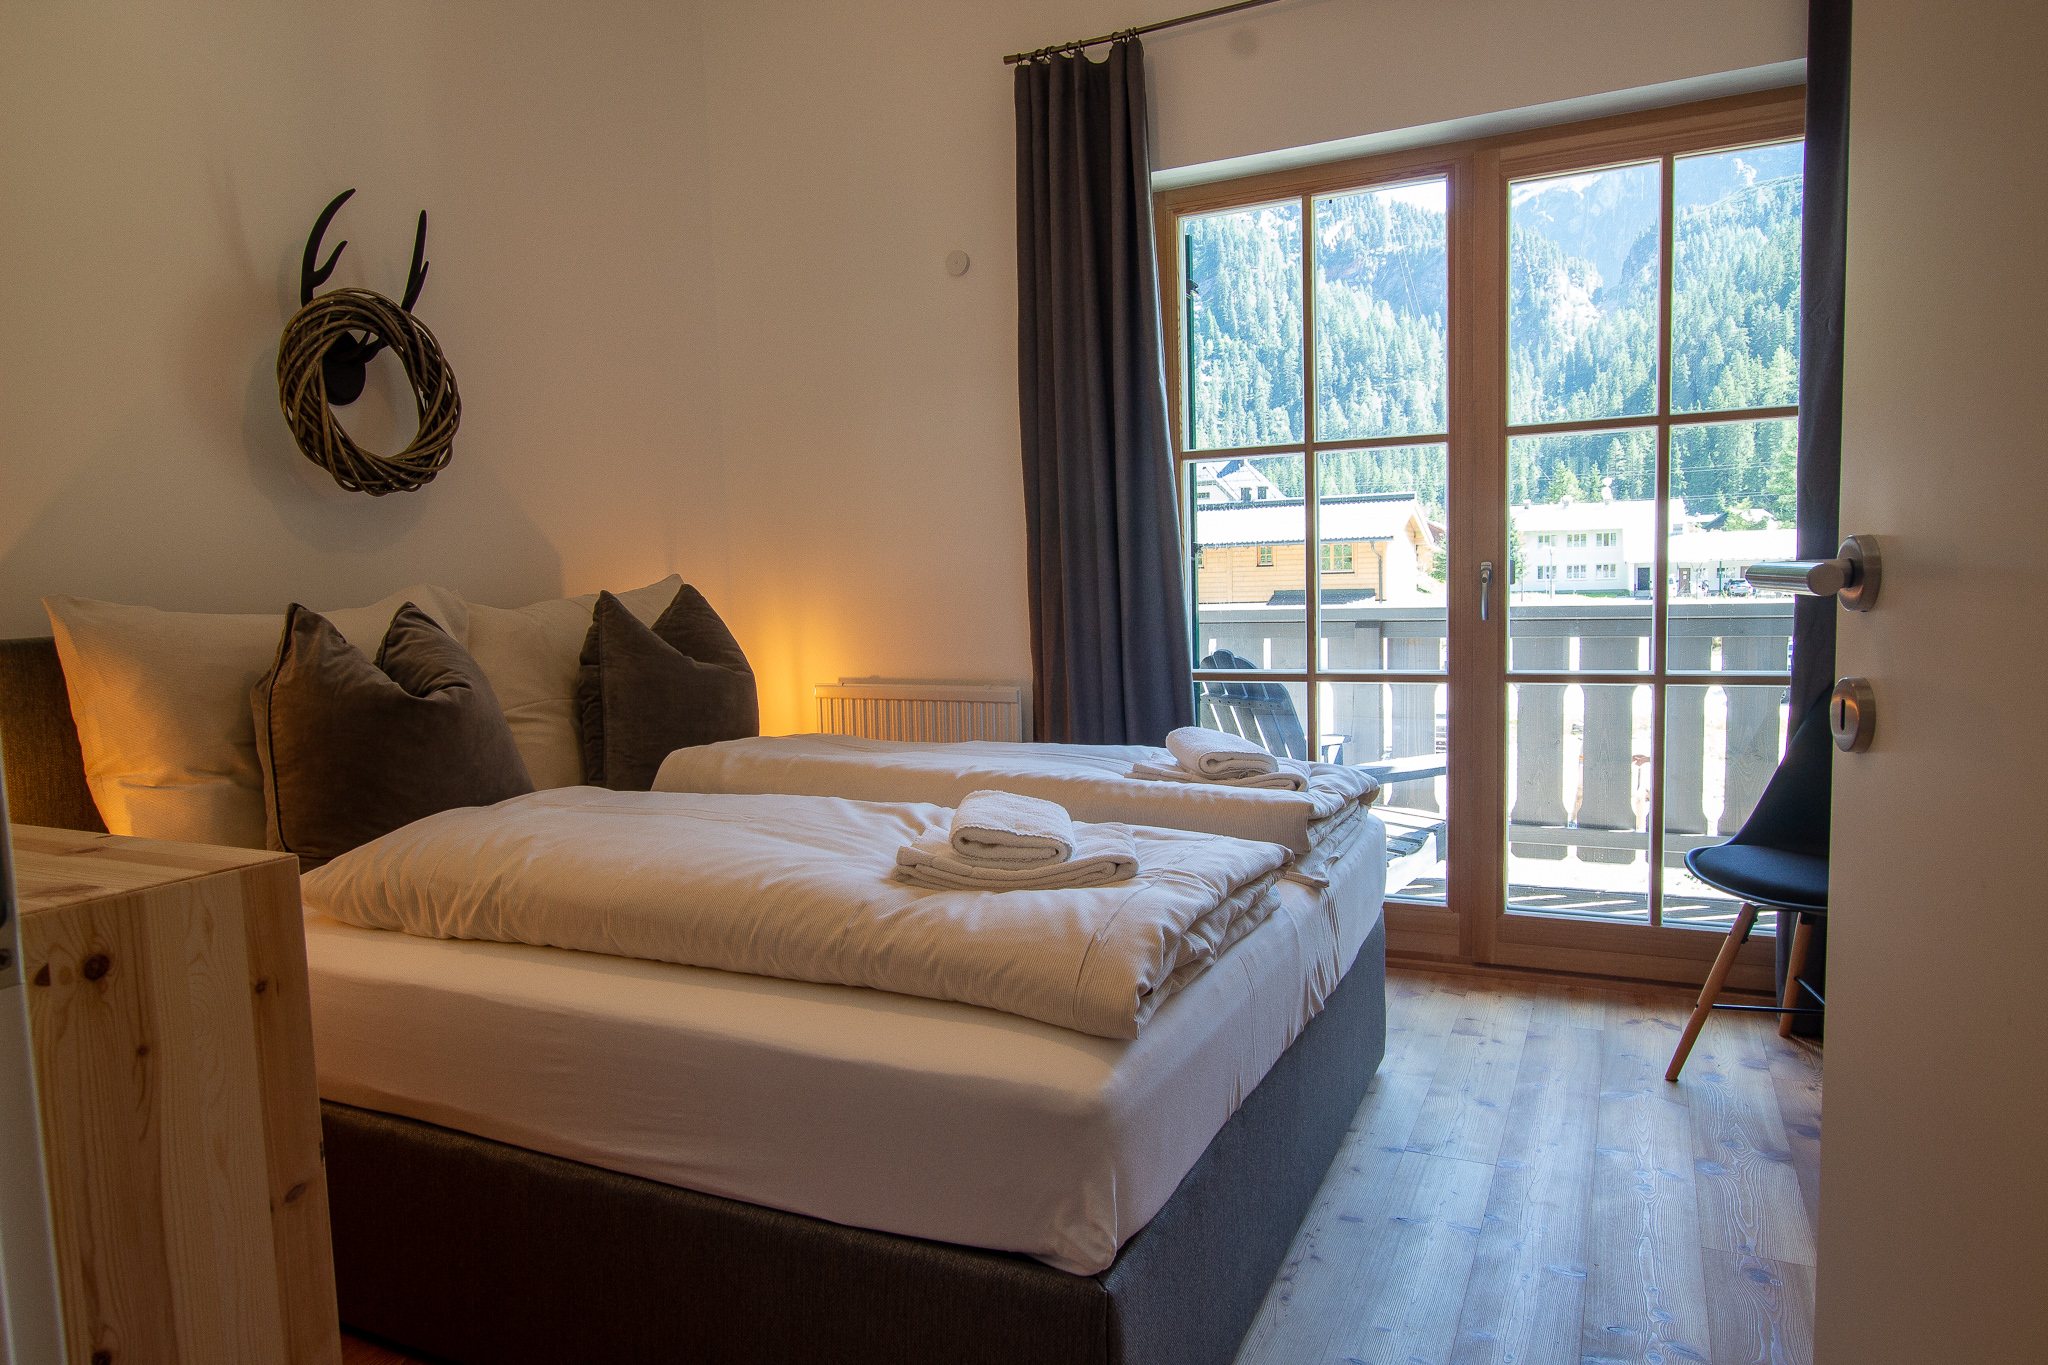 Maison de vacances Lodge Seeblick am Skilift und Bergsee für 5 (2636751), Uttendorf, Pinzgau, Salzbourg, Autriche, image 7